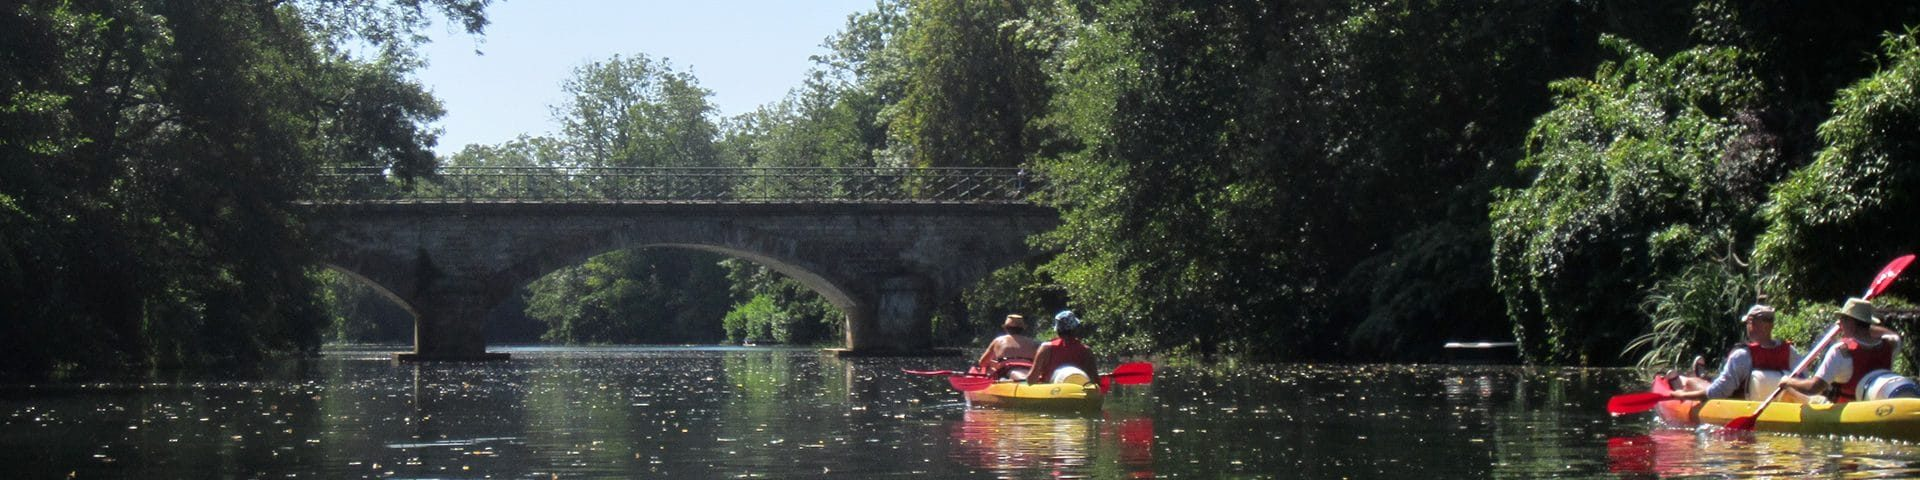 Camping La Dordogne Verte : Canoe Riviere Pont